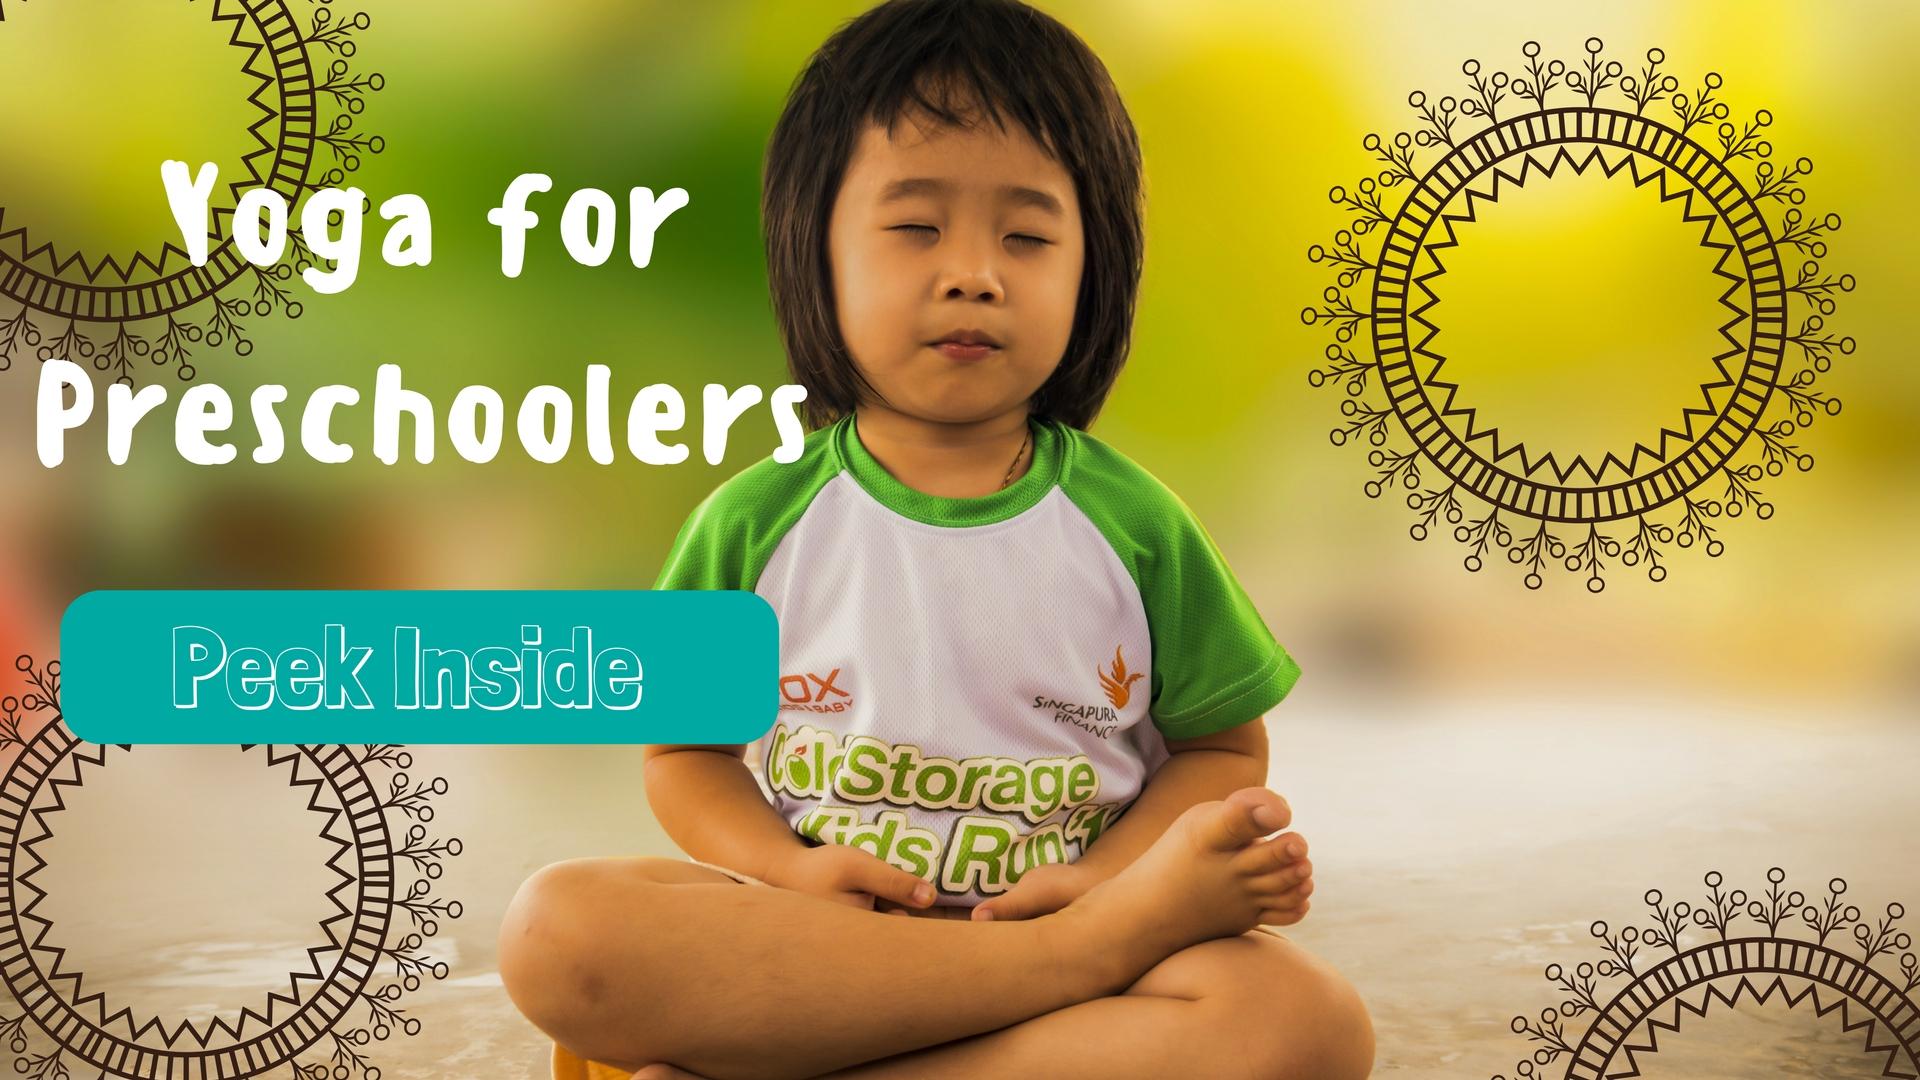 yoga for preschoolers